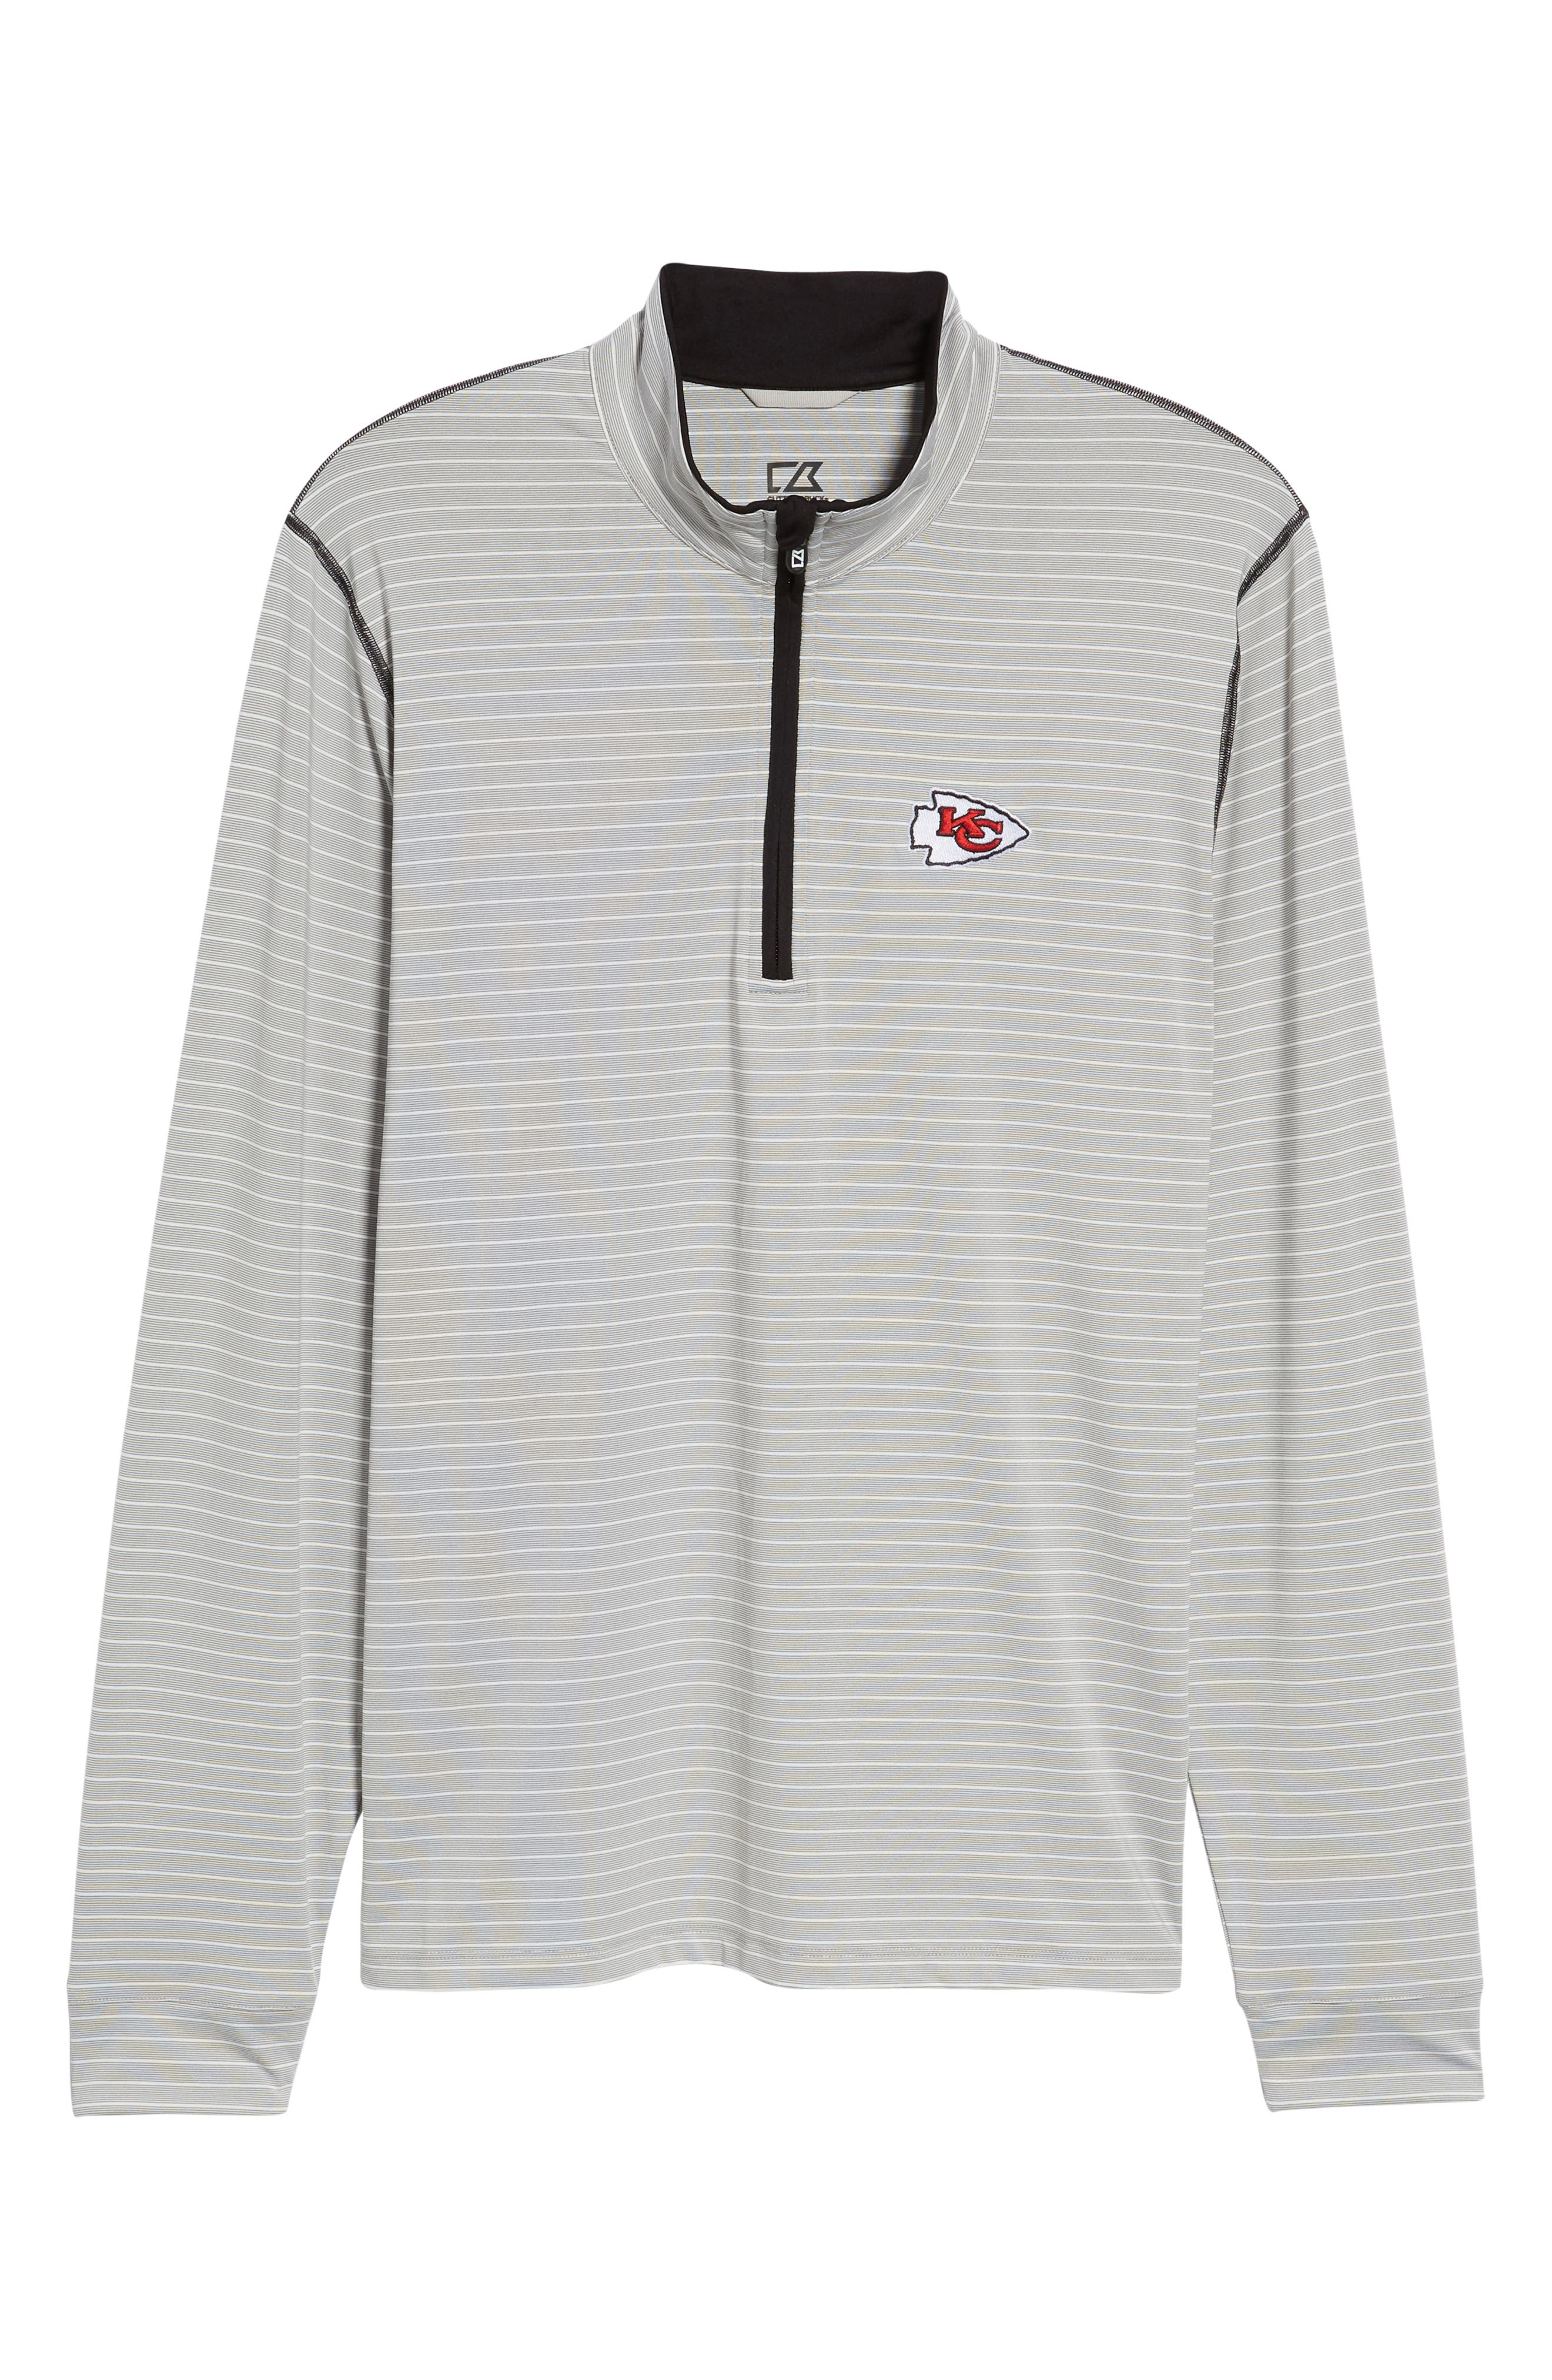 Meridian - Kansas City Chiefs Regular Fit Half Zip Pullover,                             Alternate thumbnail 6, color,                             BLACK